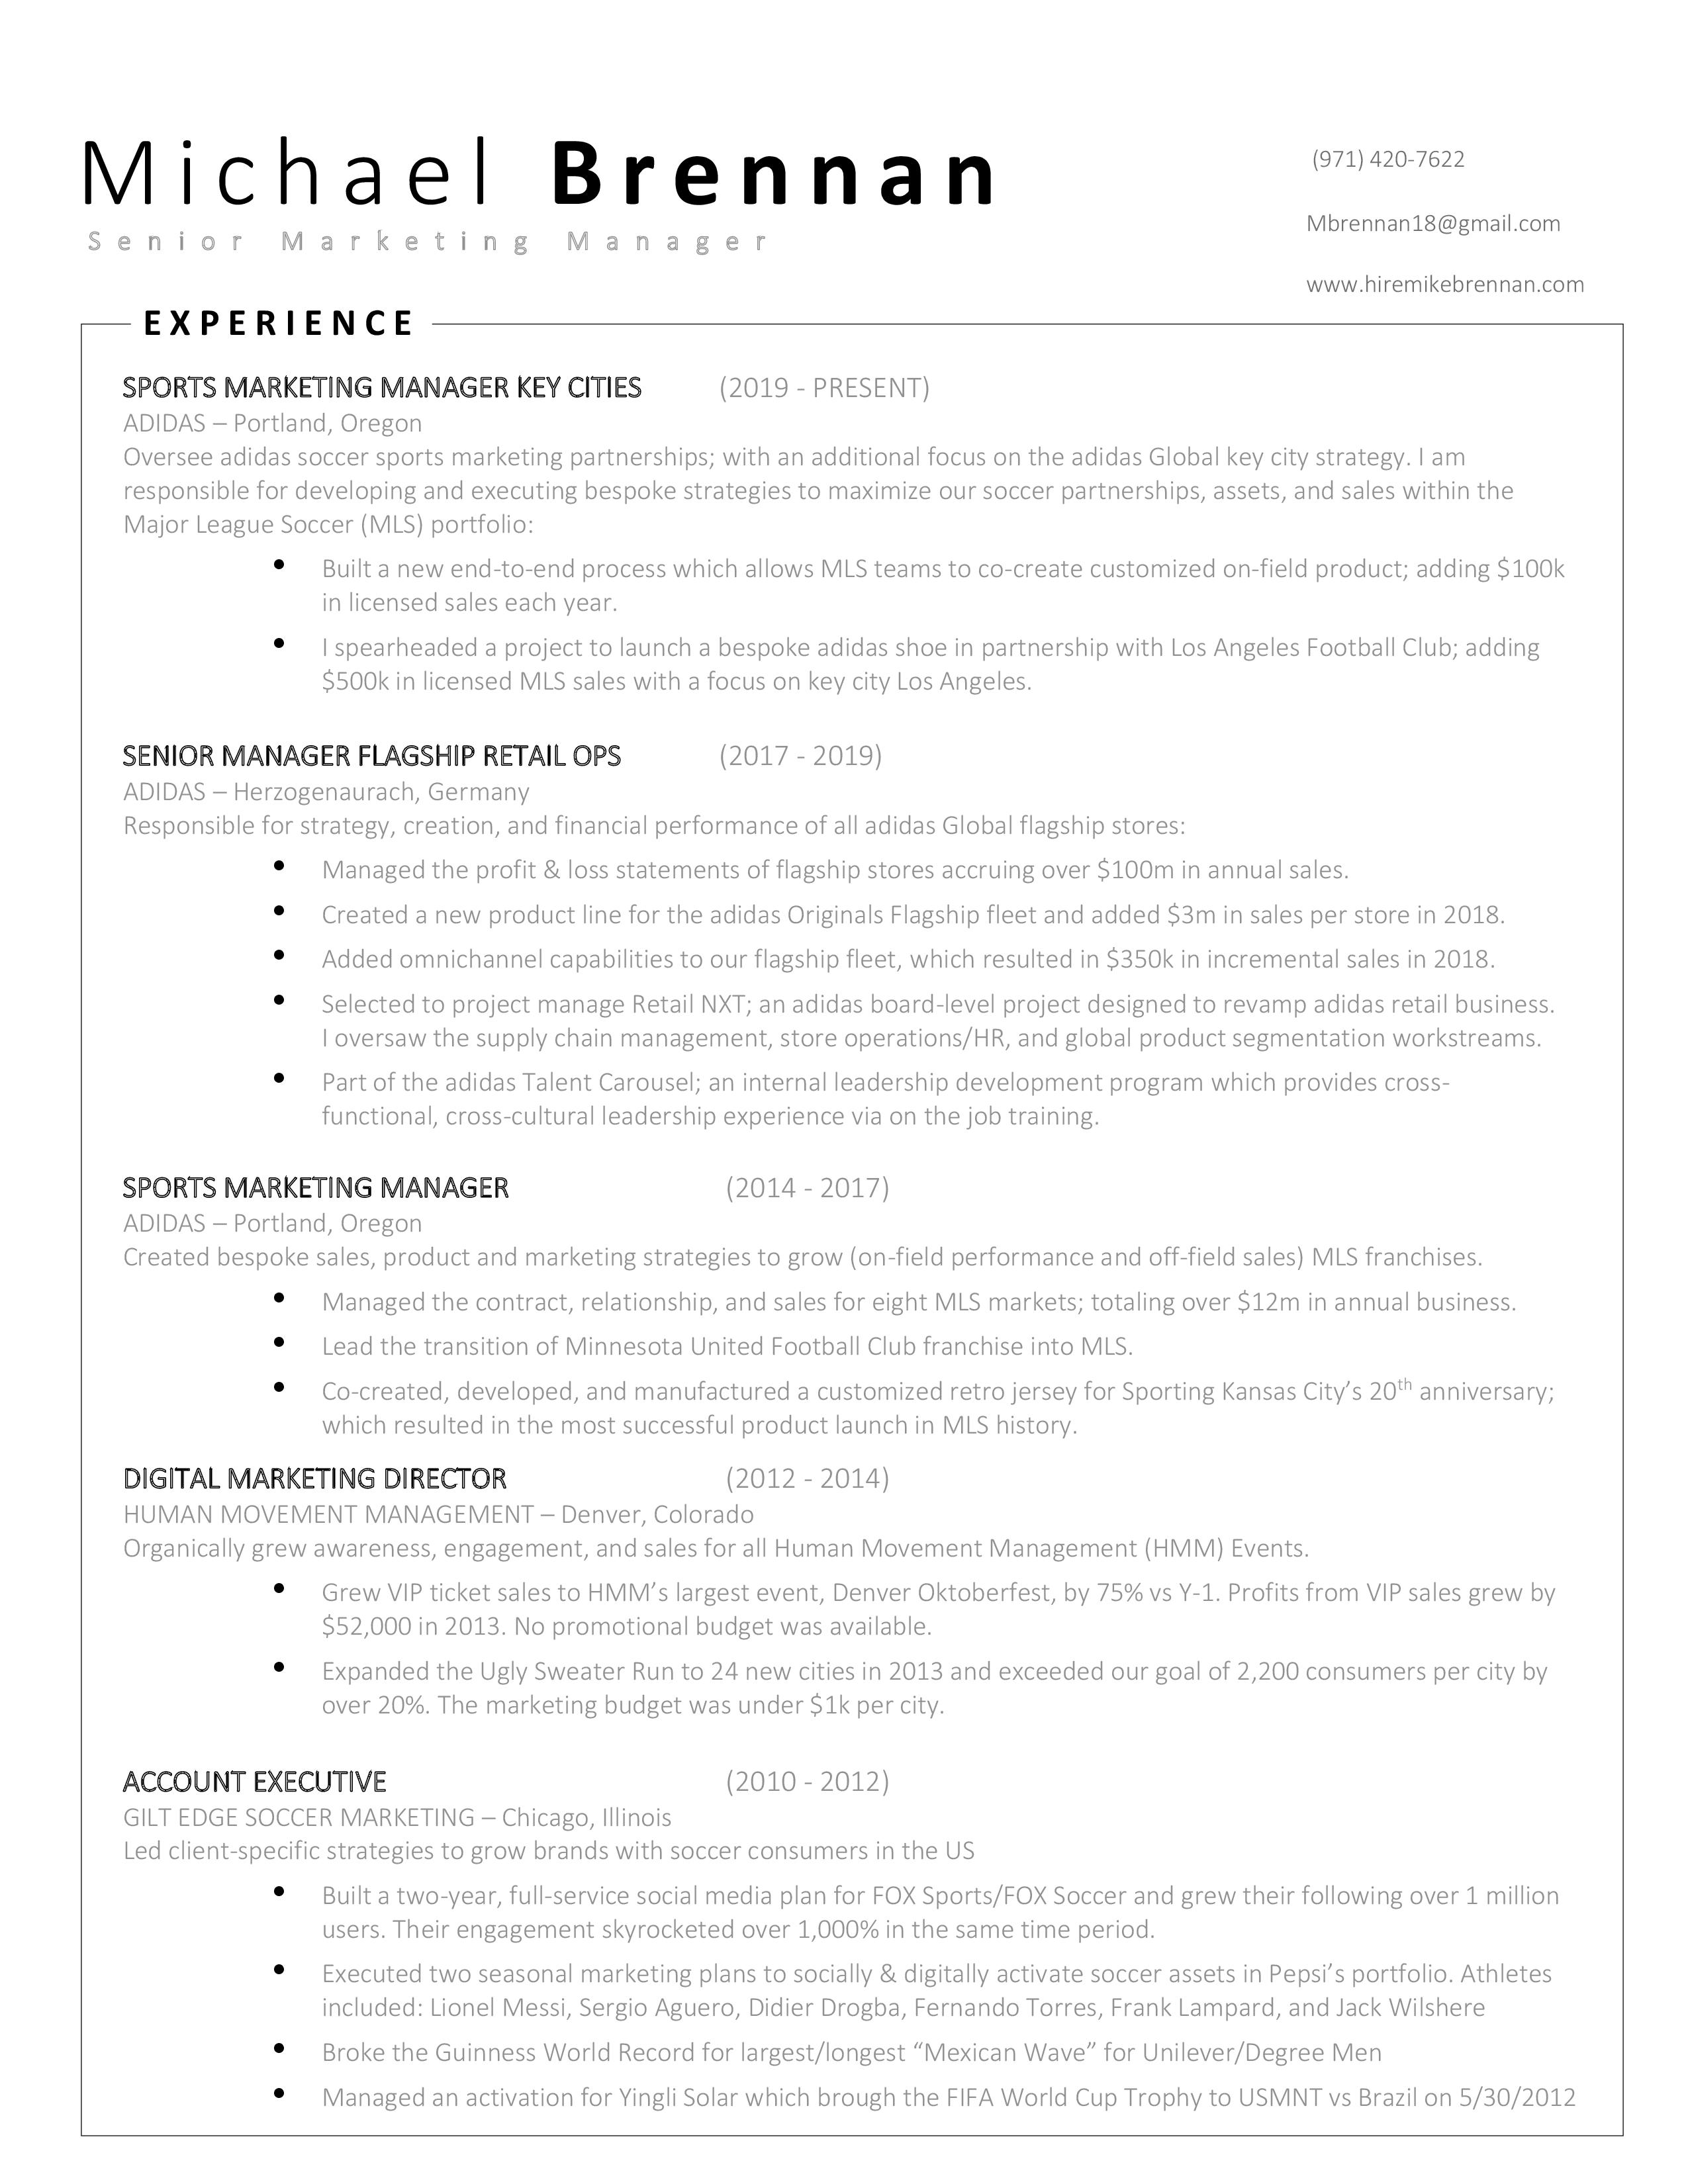 michaelbrennan-resume-page-0